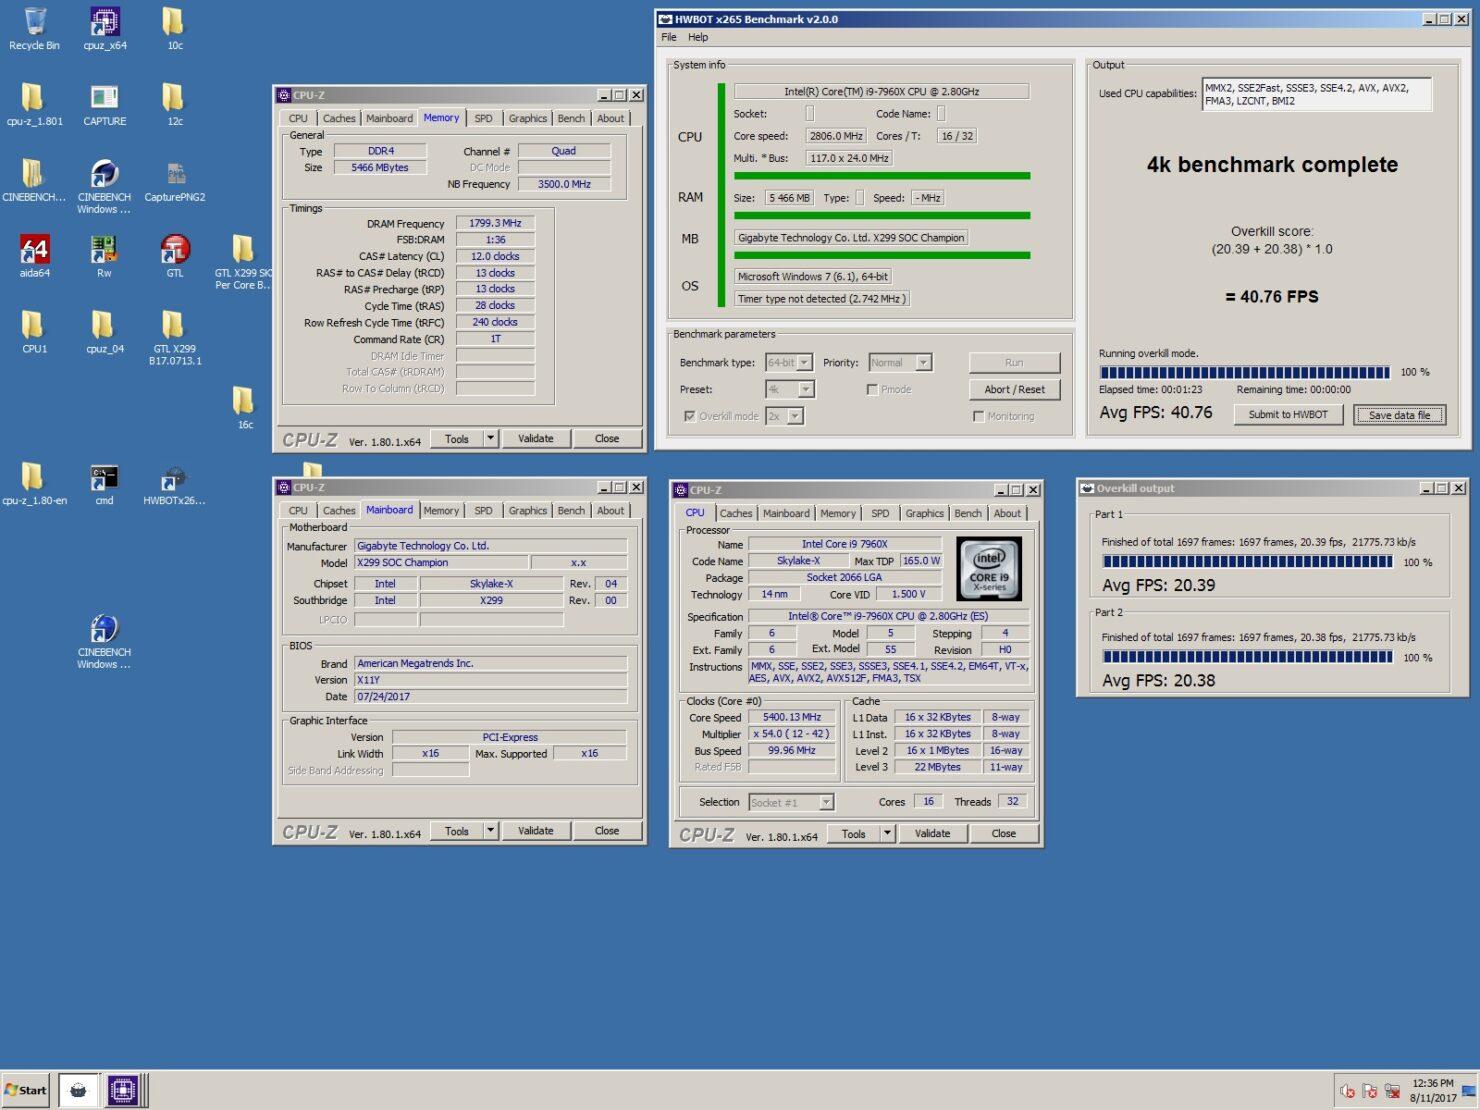 intel-core-i9-7960x_hwbot-x265-benchmark-4k